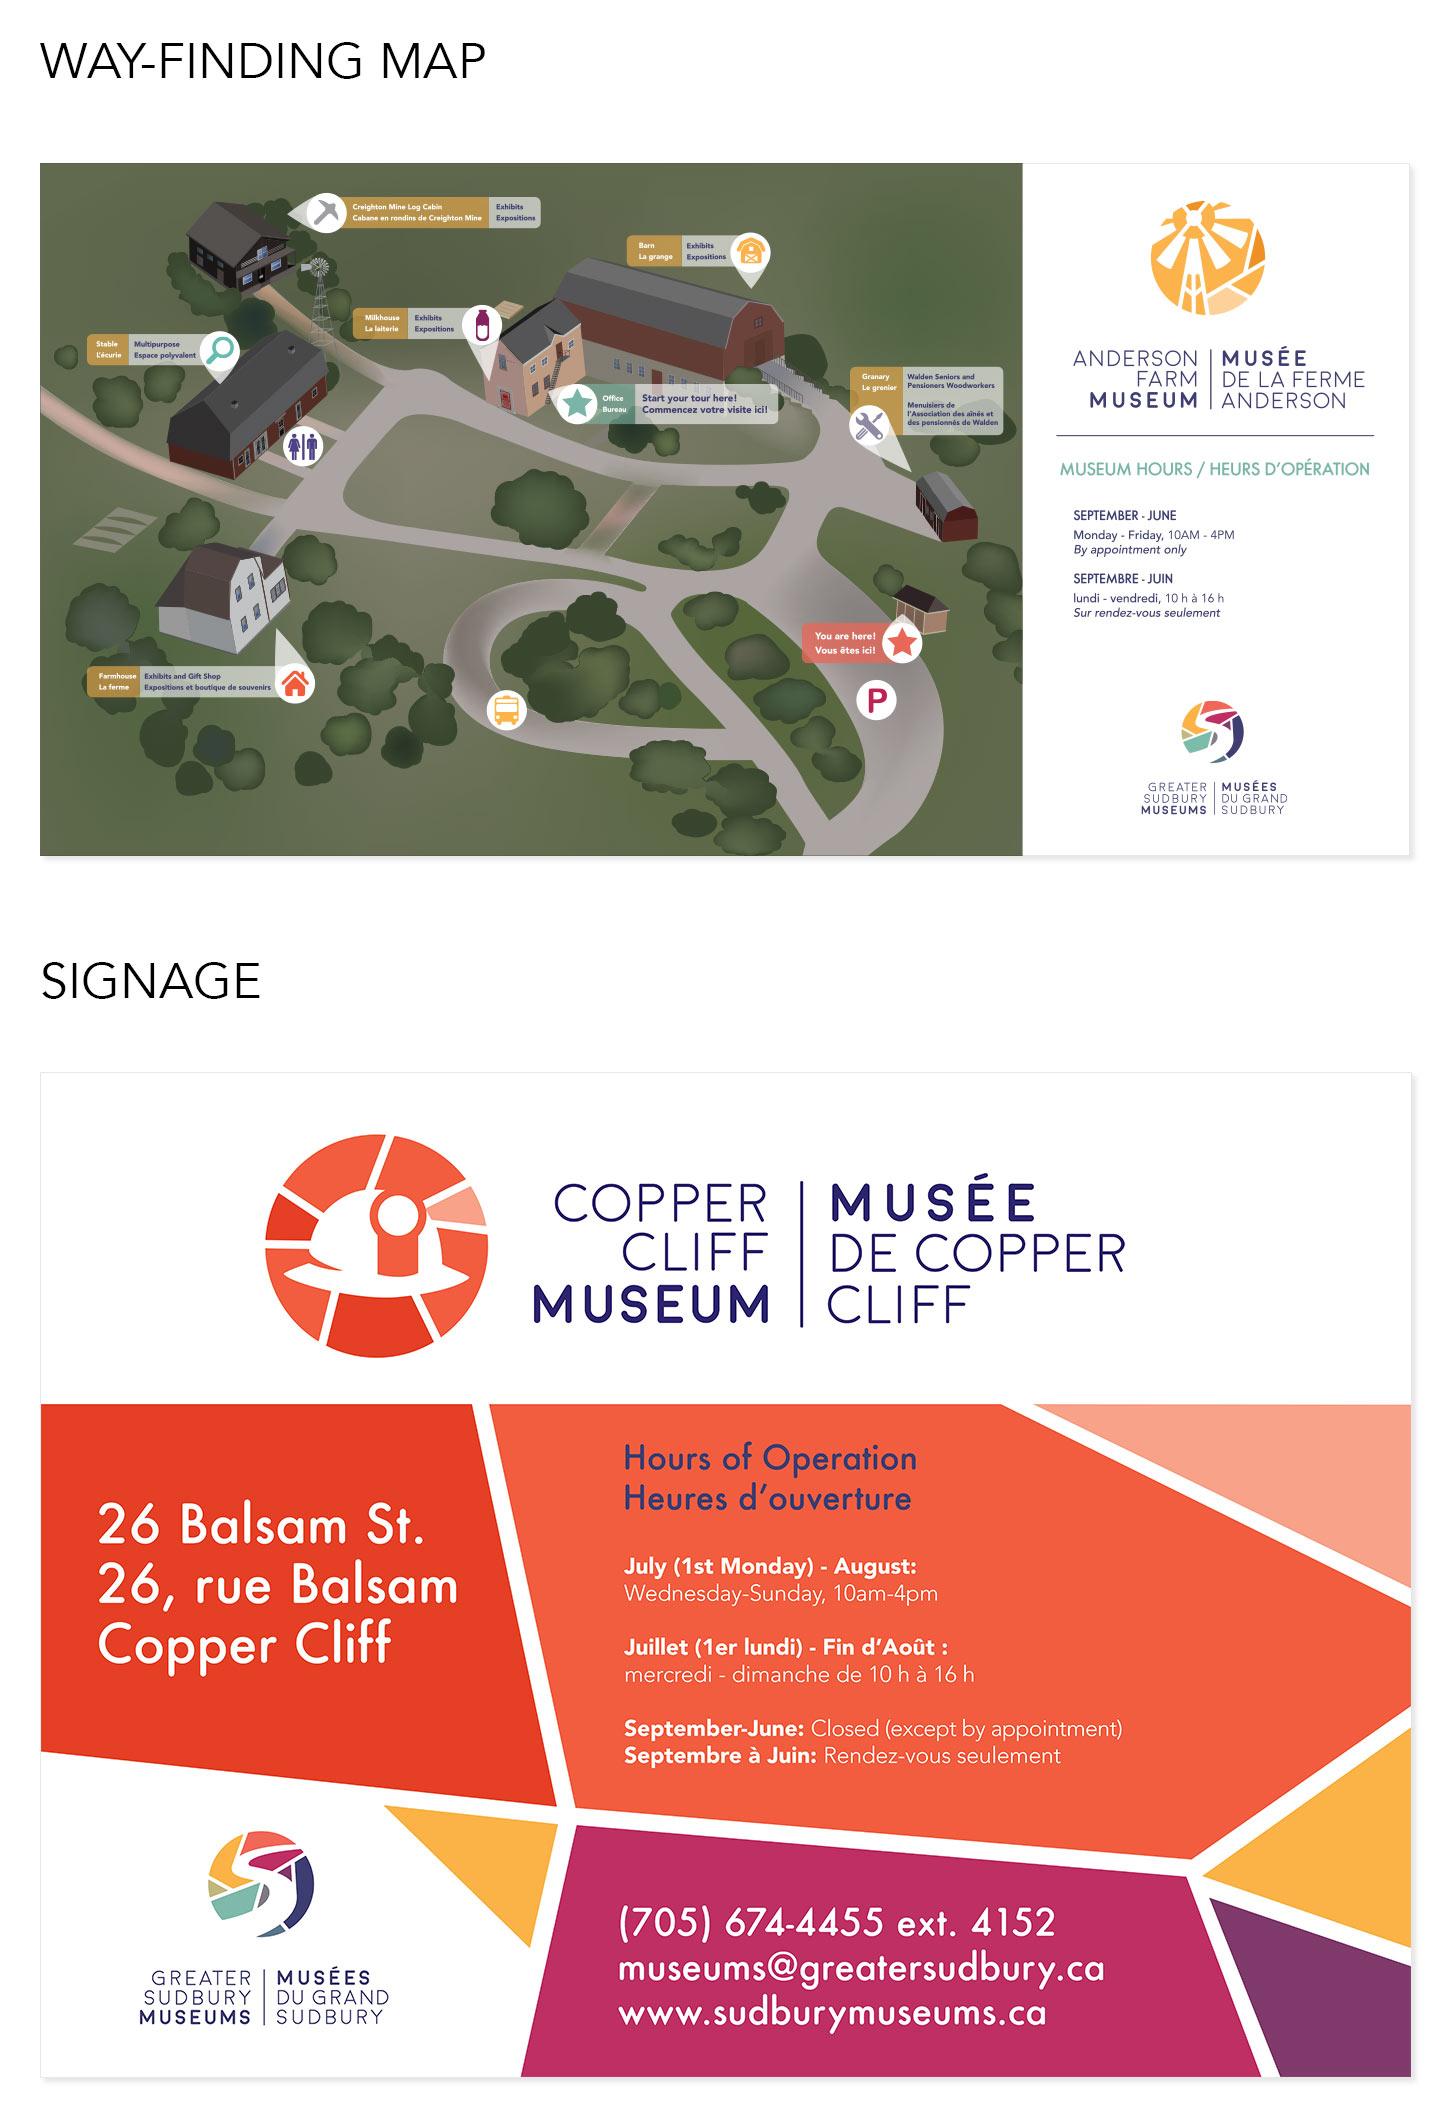 Greater-Sudbury-Museums-3-HighRes-web.jpg